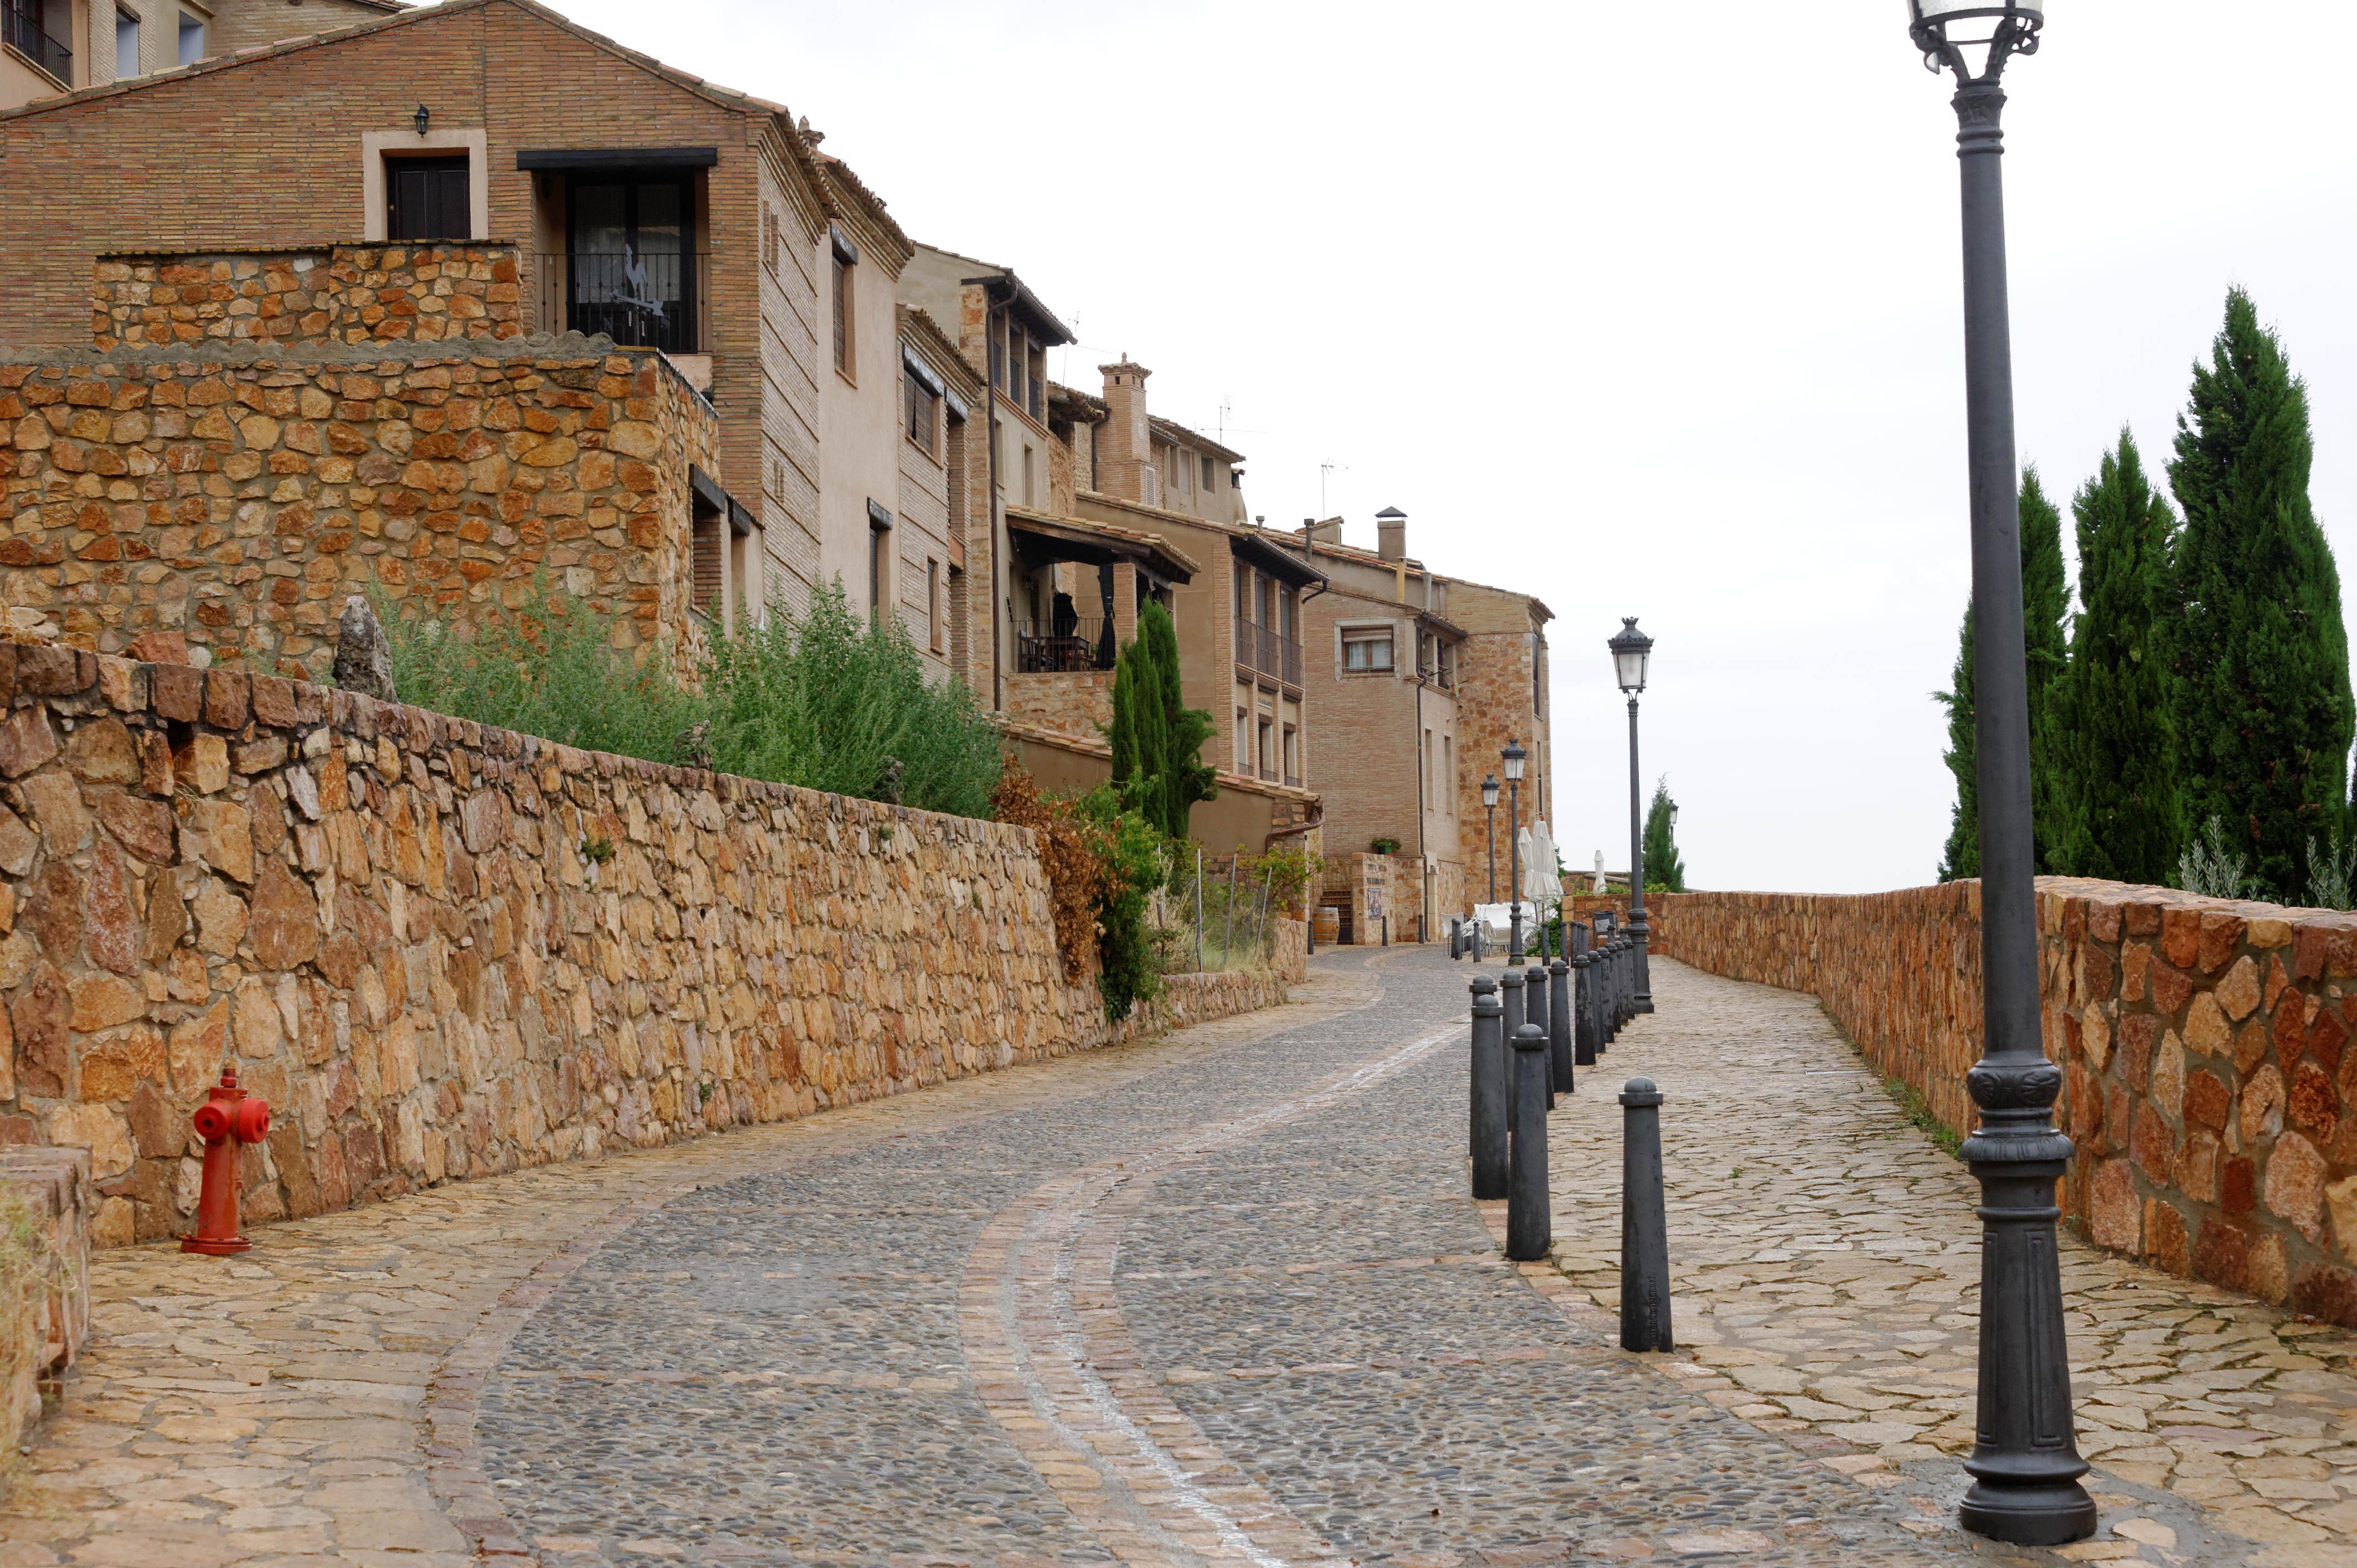 4303_Alquezar (Aragon)